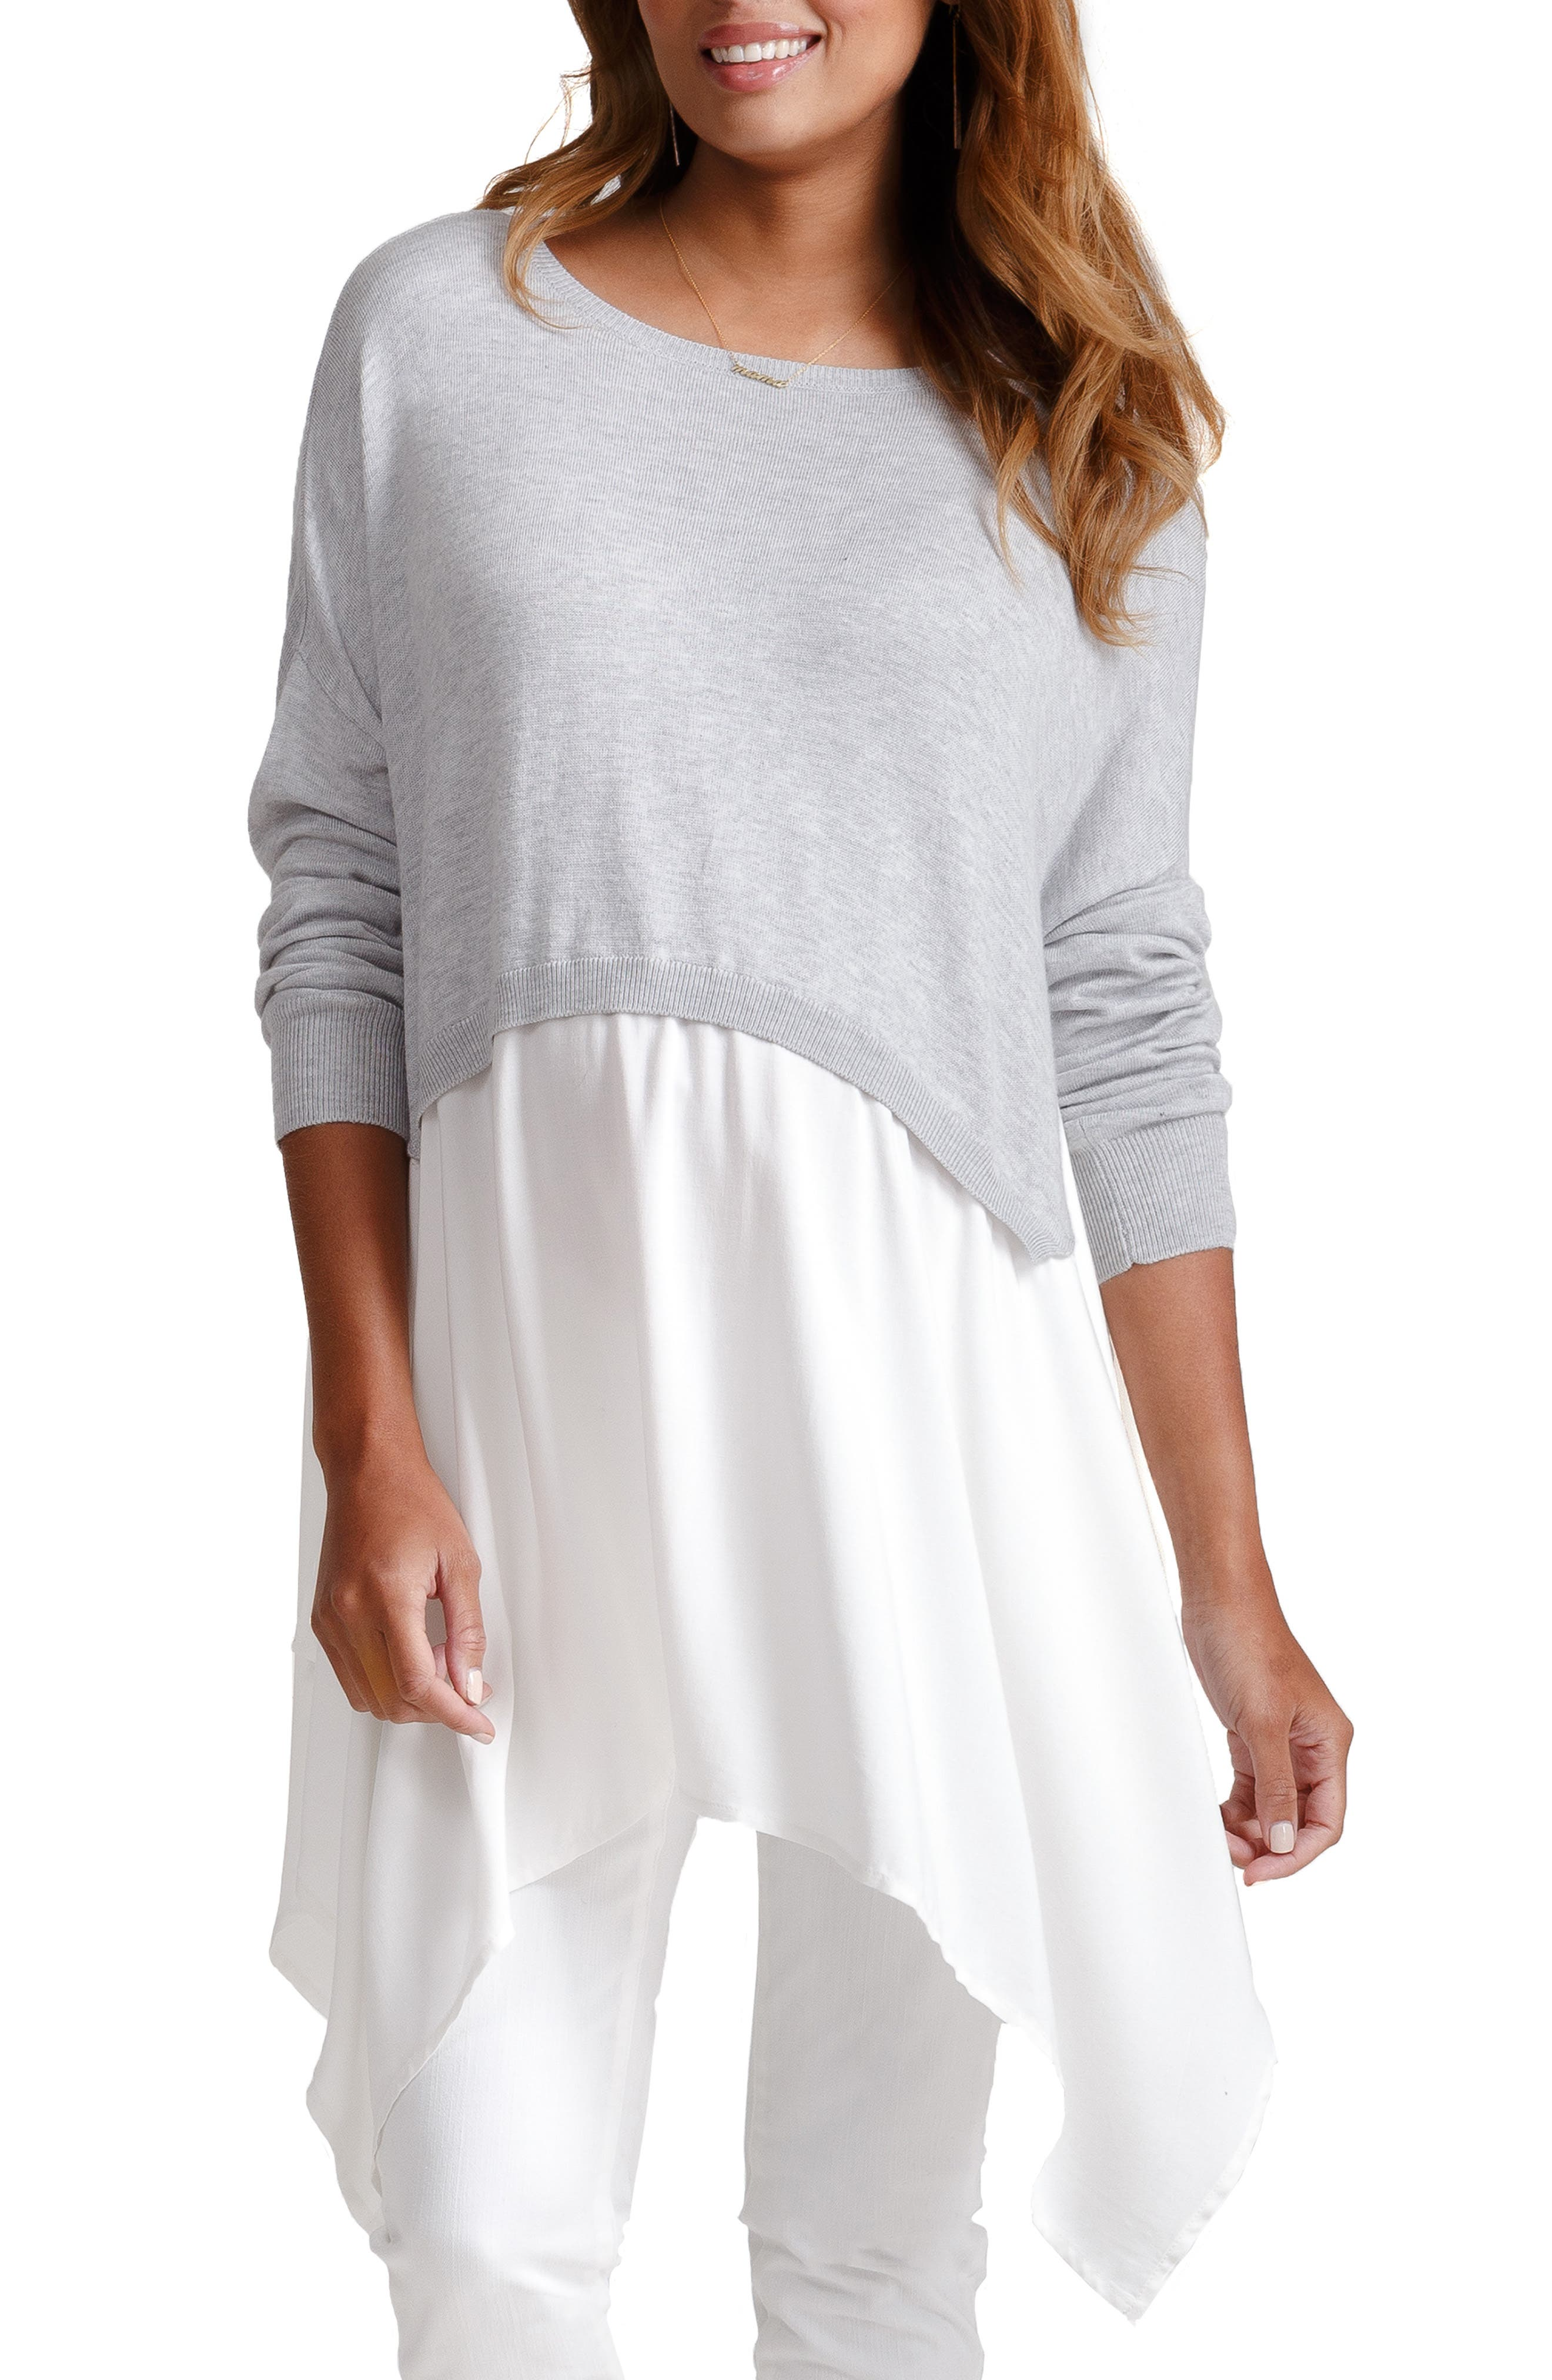 Drapey Swing Mixed Media Maternity/Nursing Sweater,                             Main thumbnail 1, color,                             LIGHT HEATHER GRAY WITH IVORY